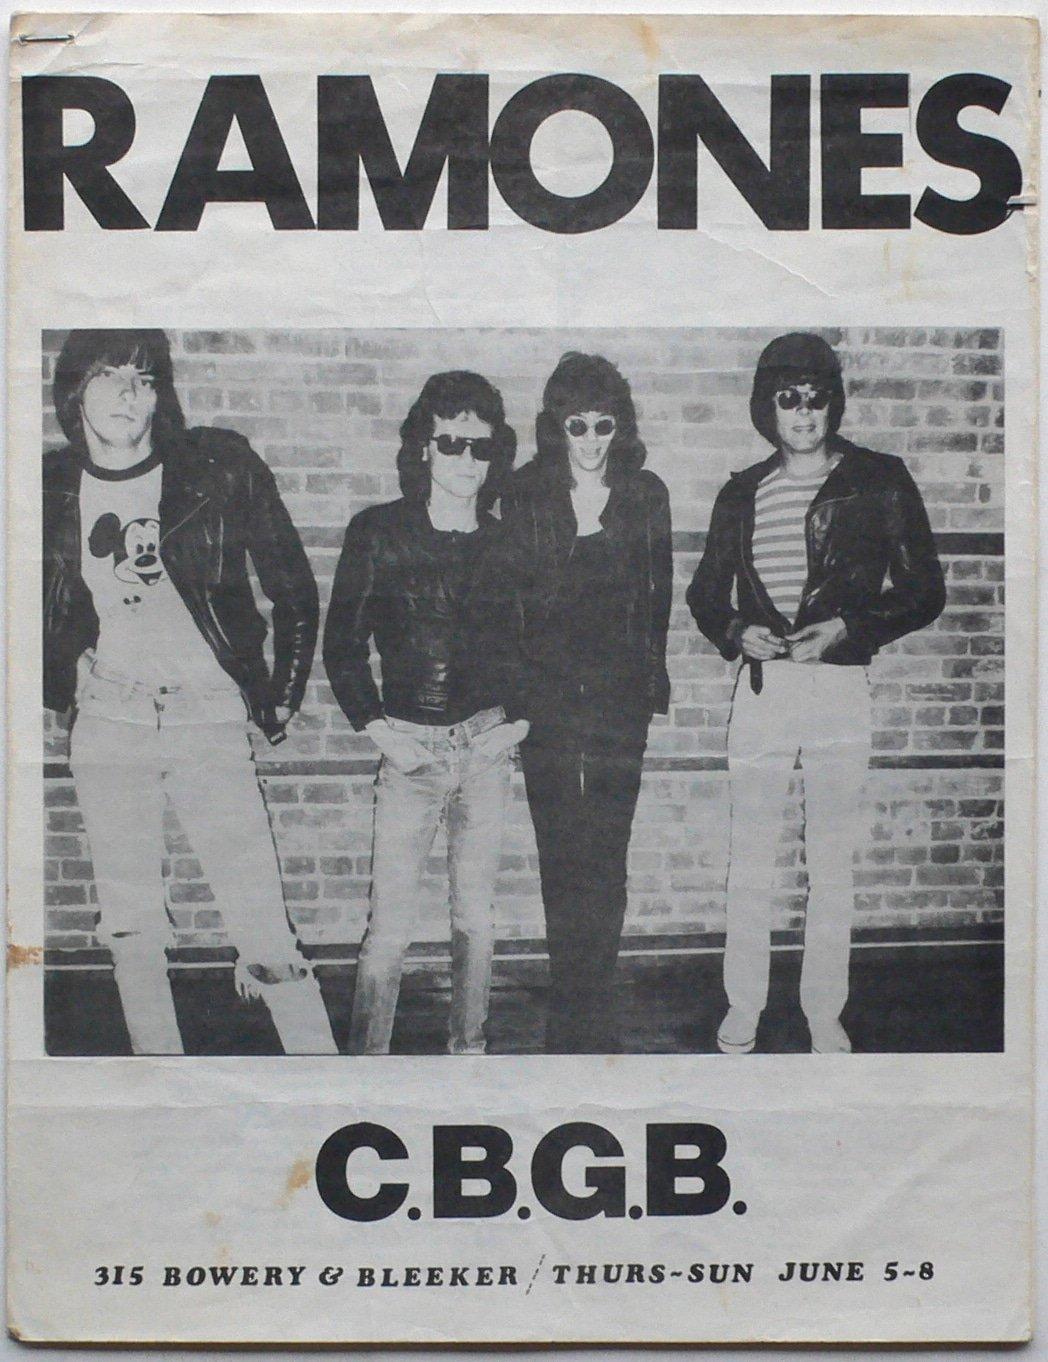 The ramones cbgb